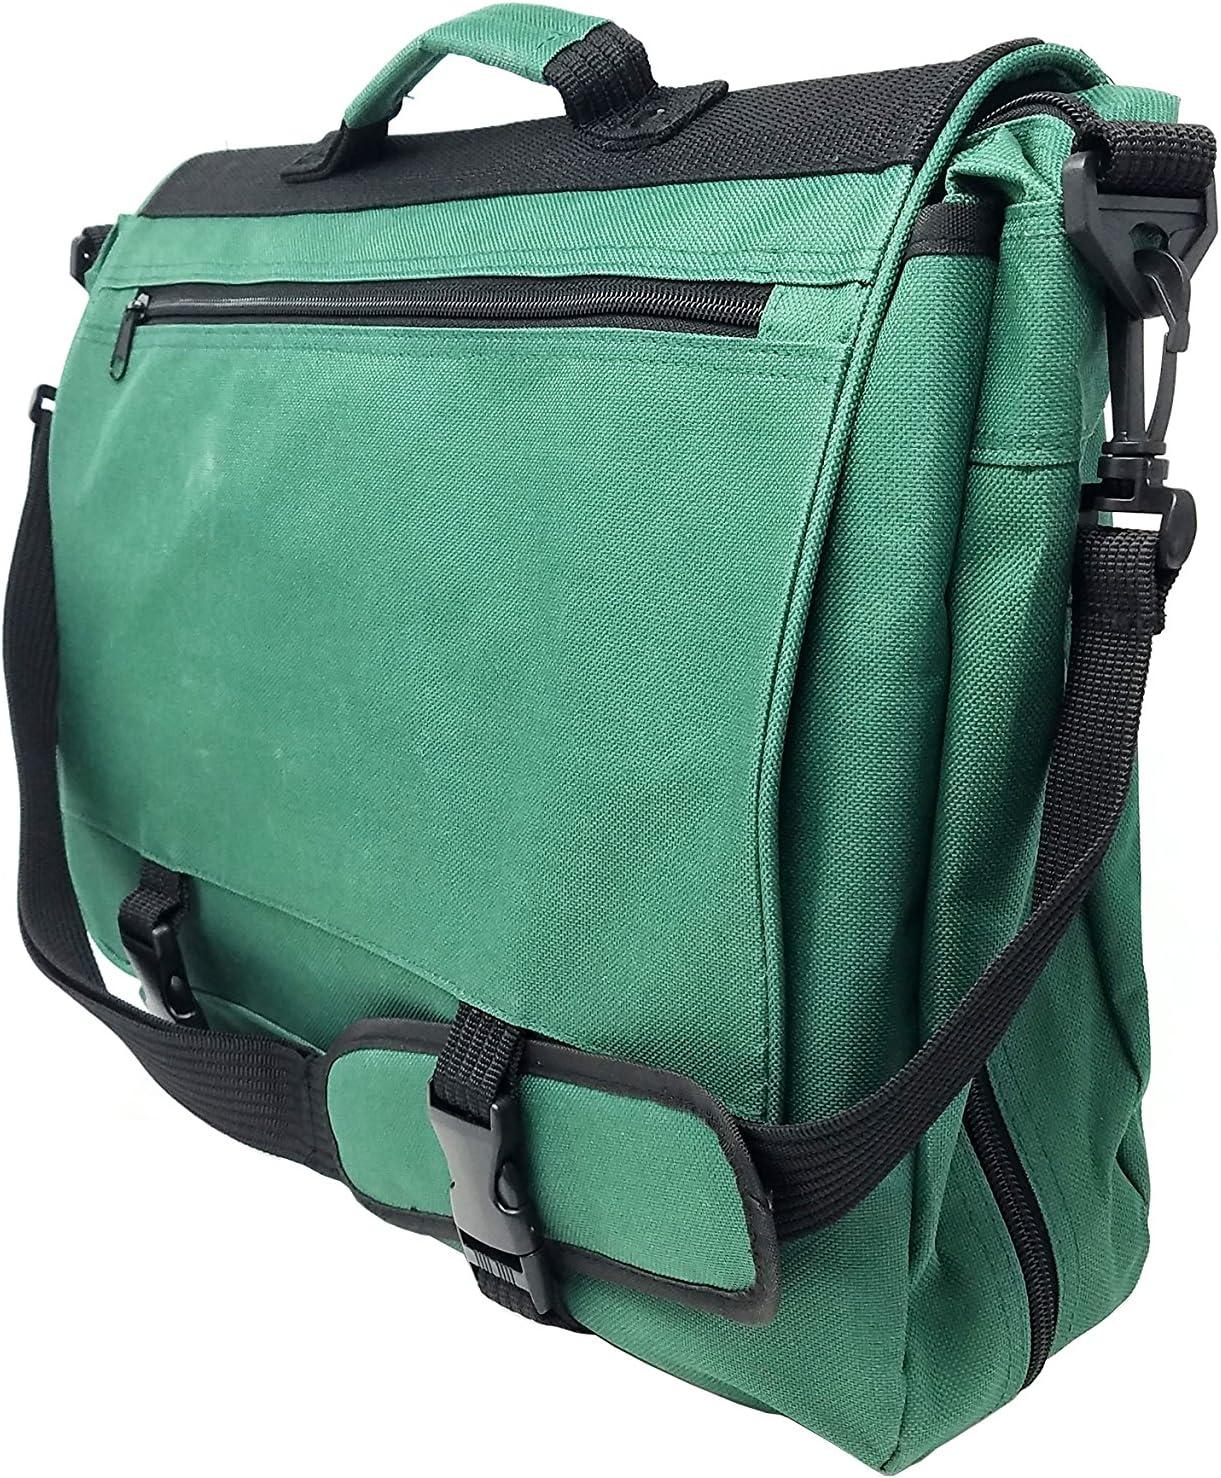 "ImpecGear 16.5"" 17"" Inches Expandable Laptop Case Briefcase Messenger Bag Computer Bag (PFG Dark Green 17"")"